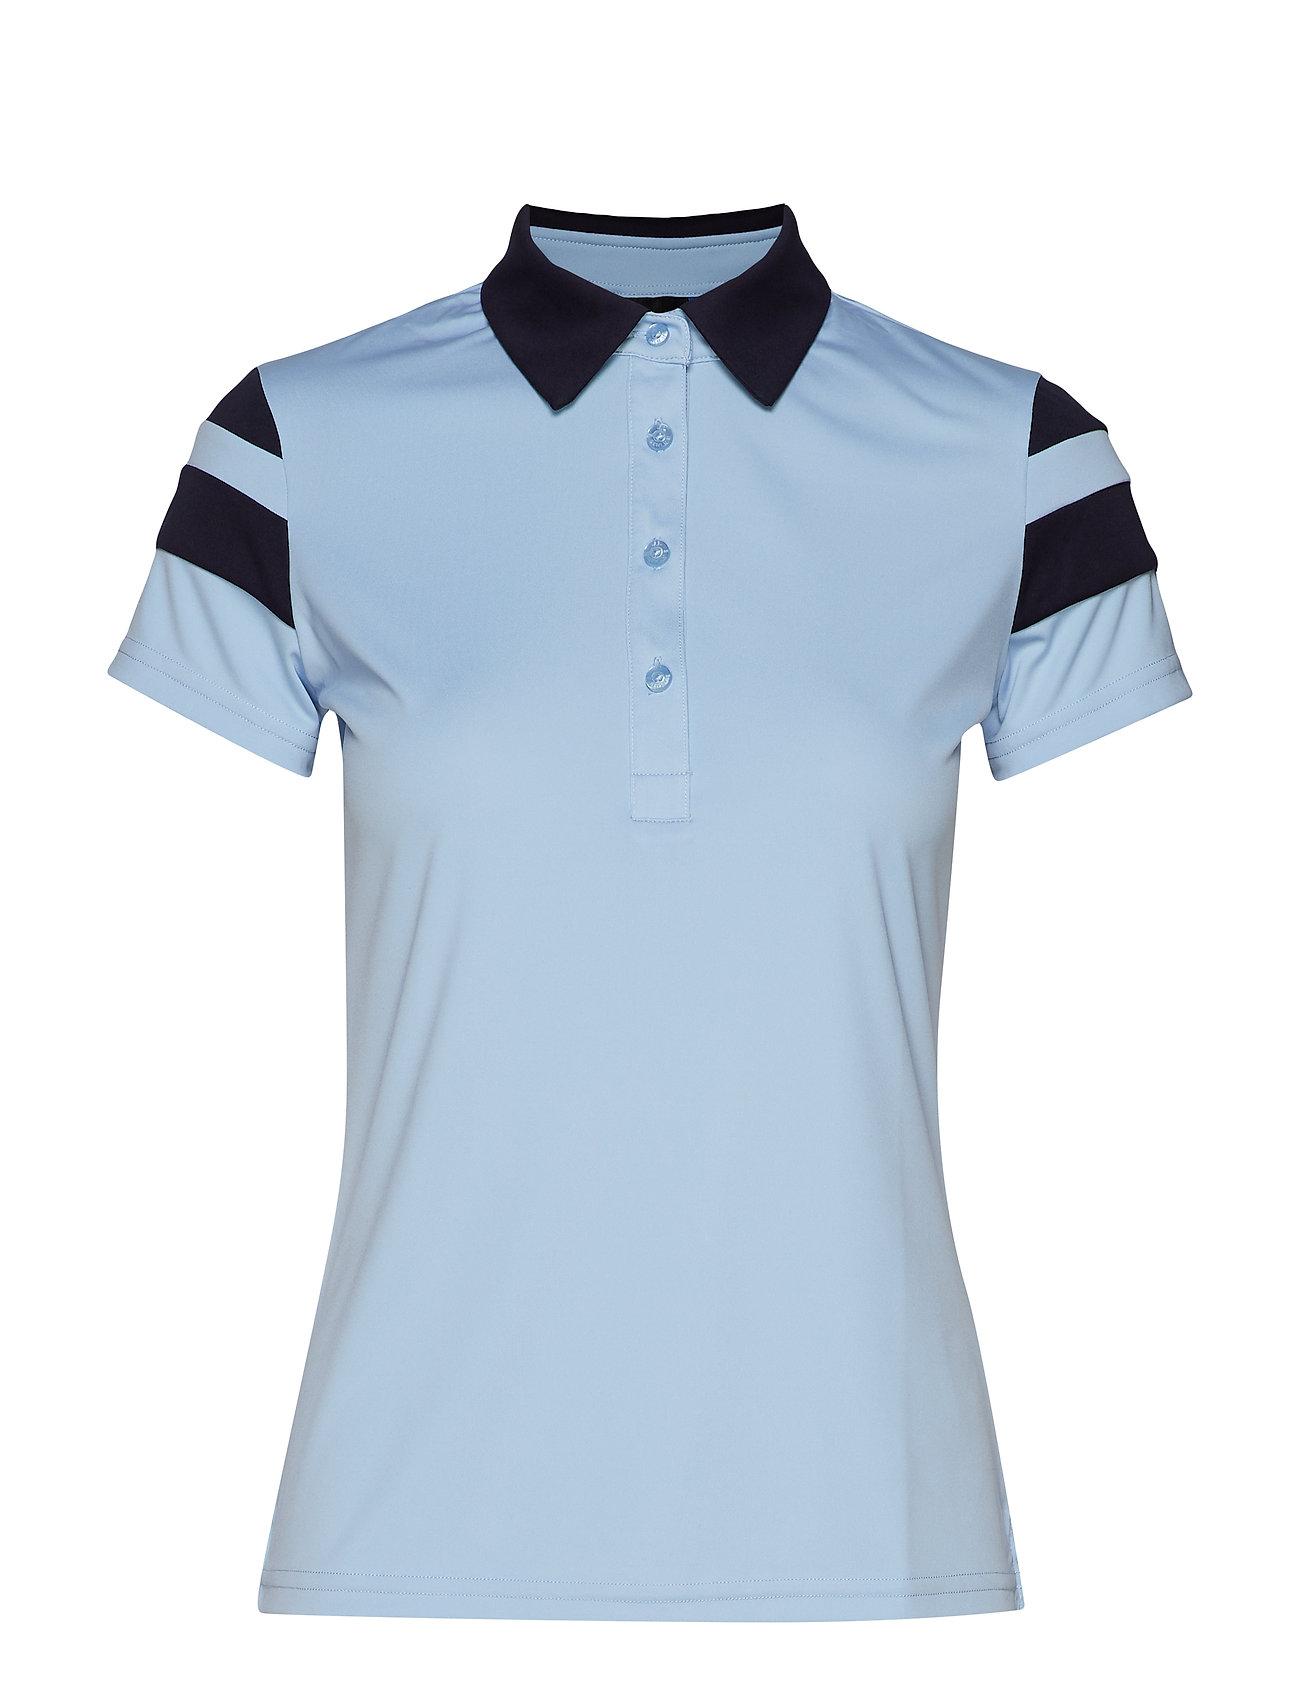 J. Lindeberg Golf Pixie-TX Jersey - BABY WHISPER